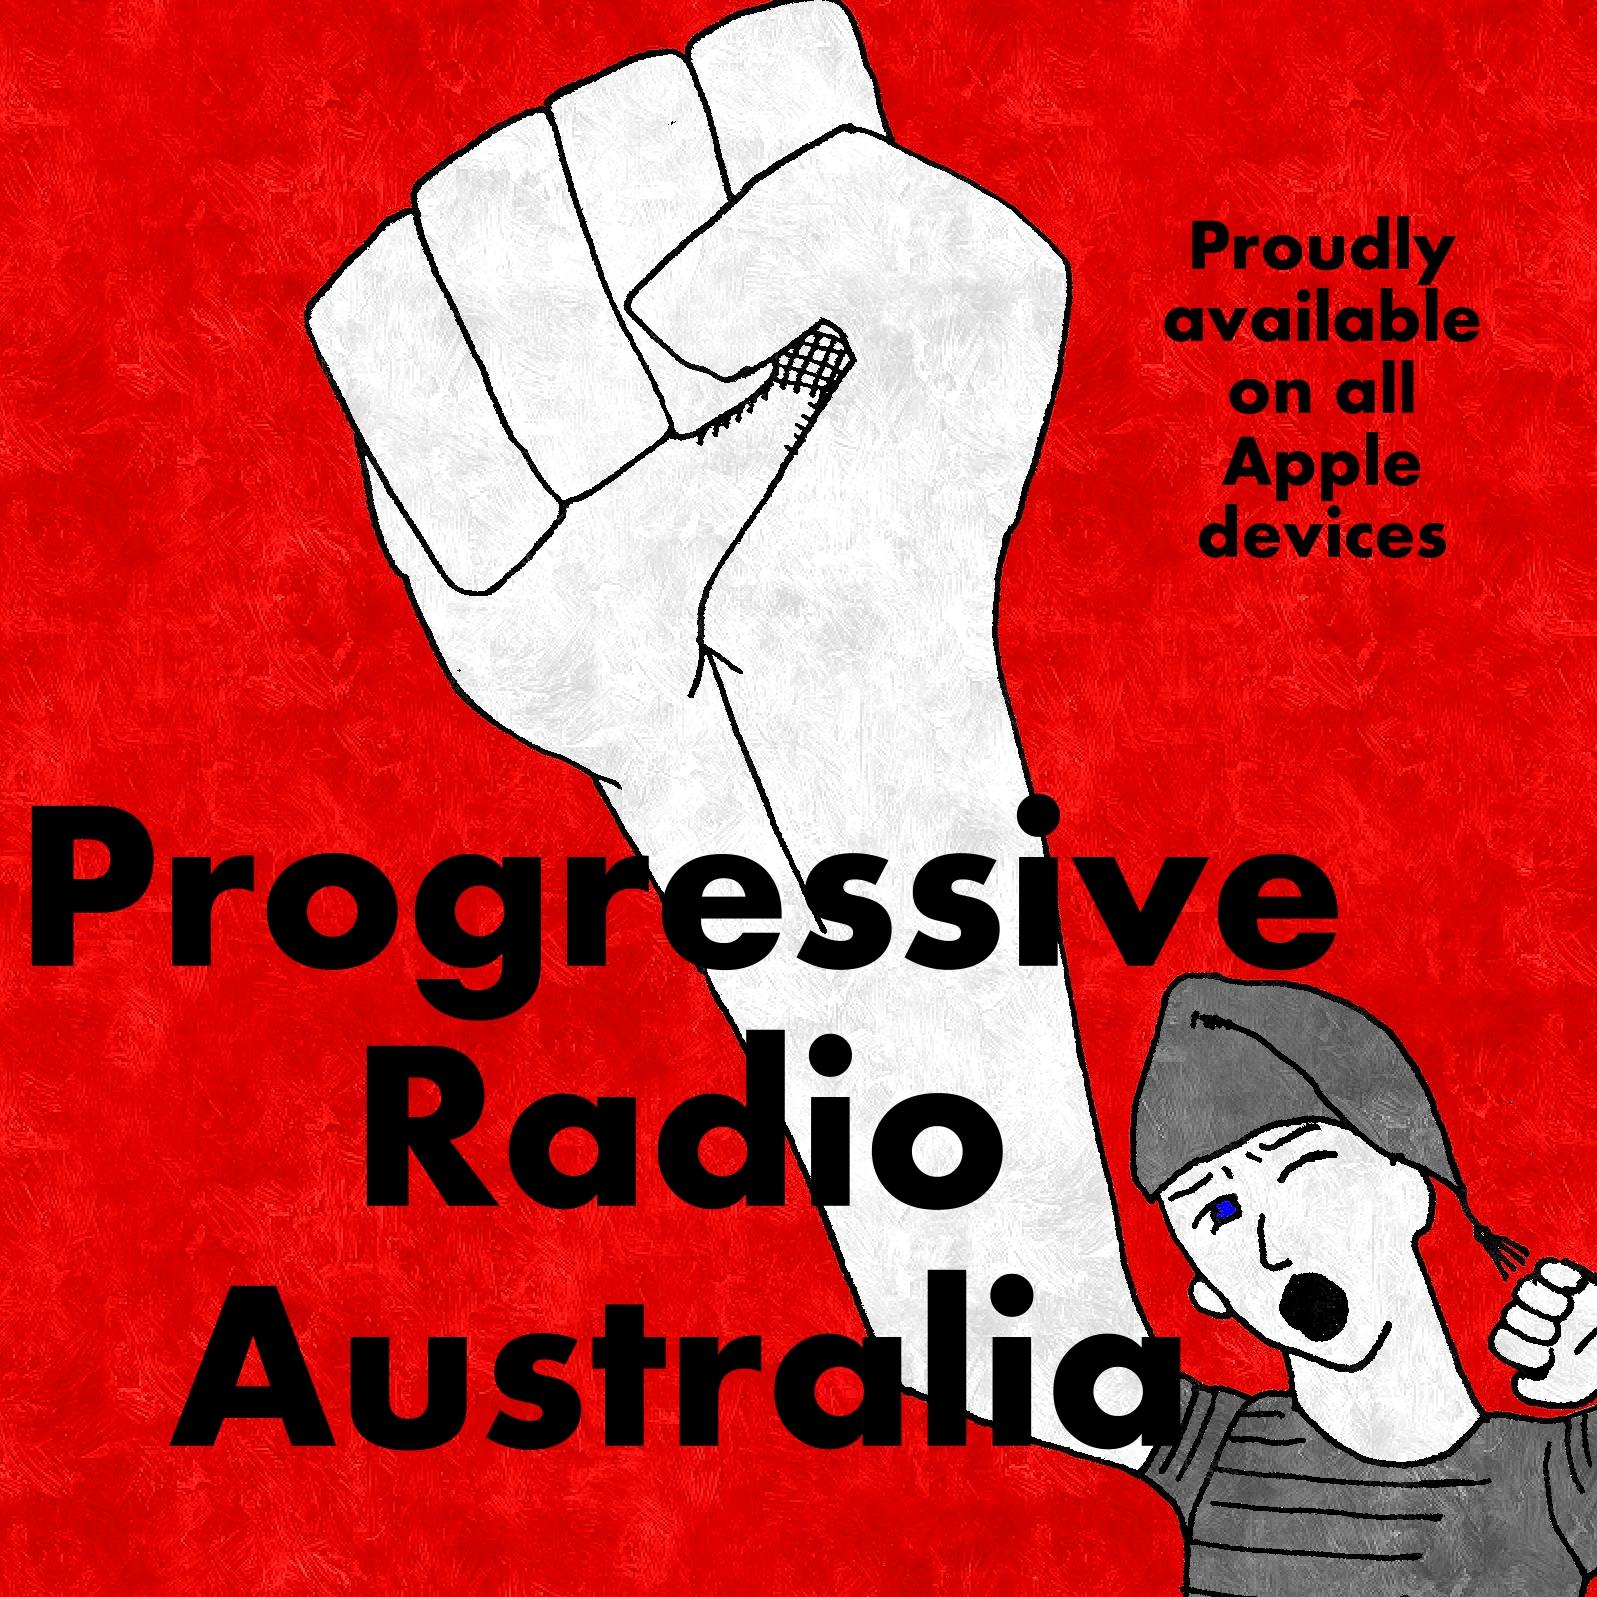 Progressive Radio Australia